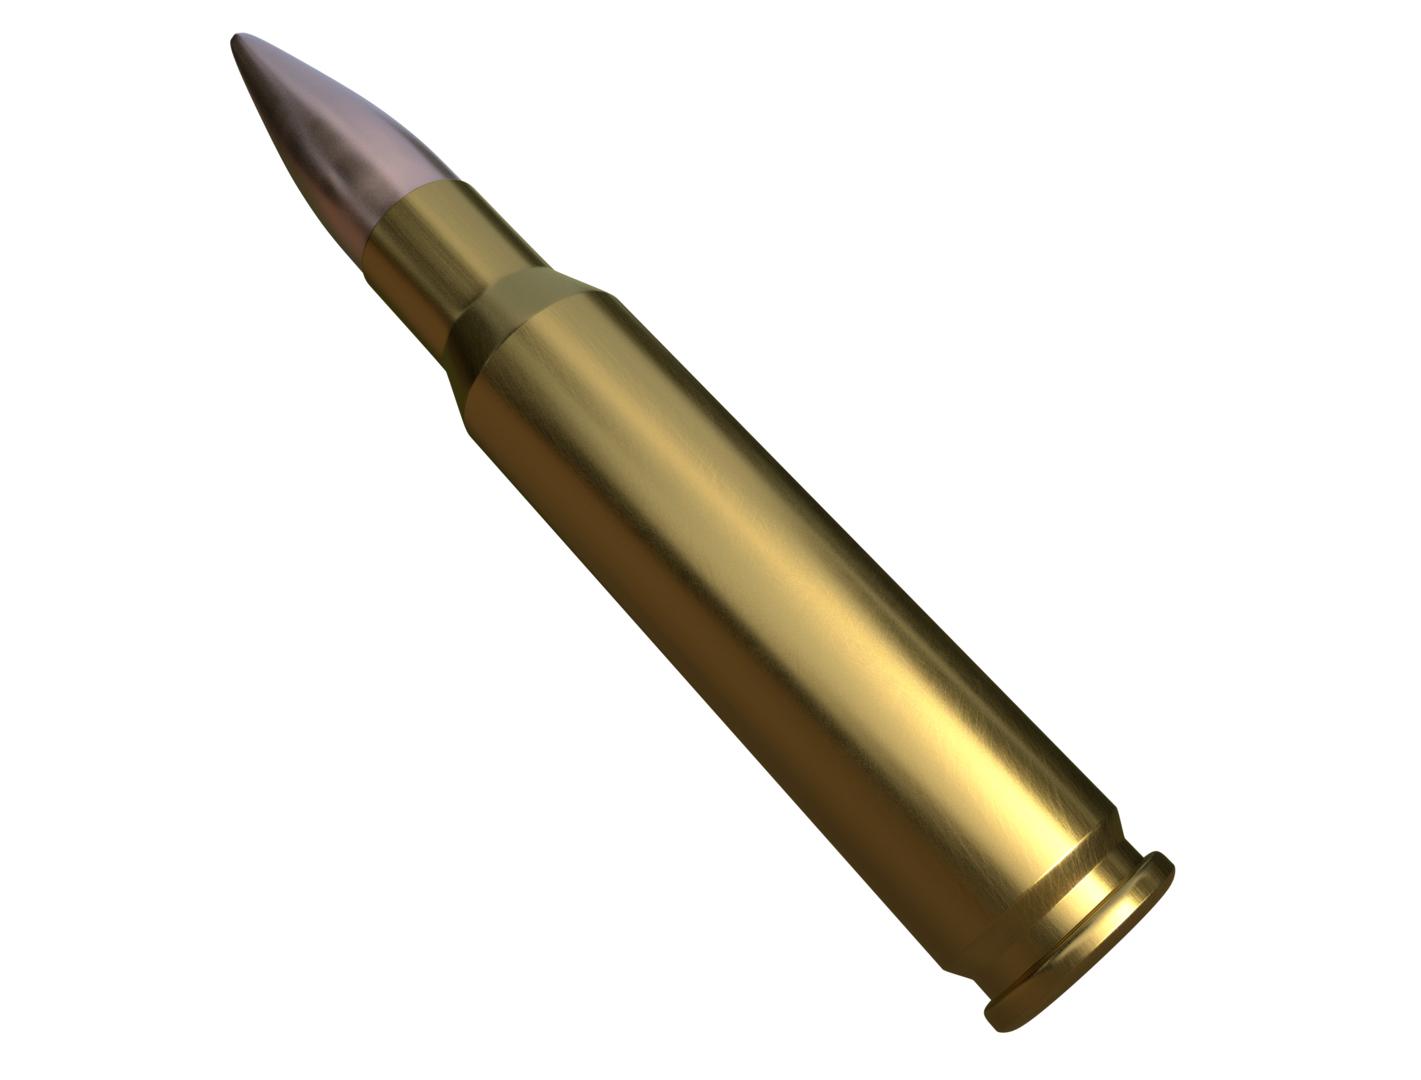 3D rifle bullet model